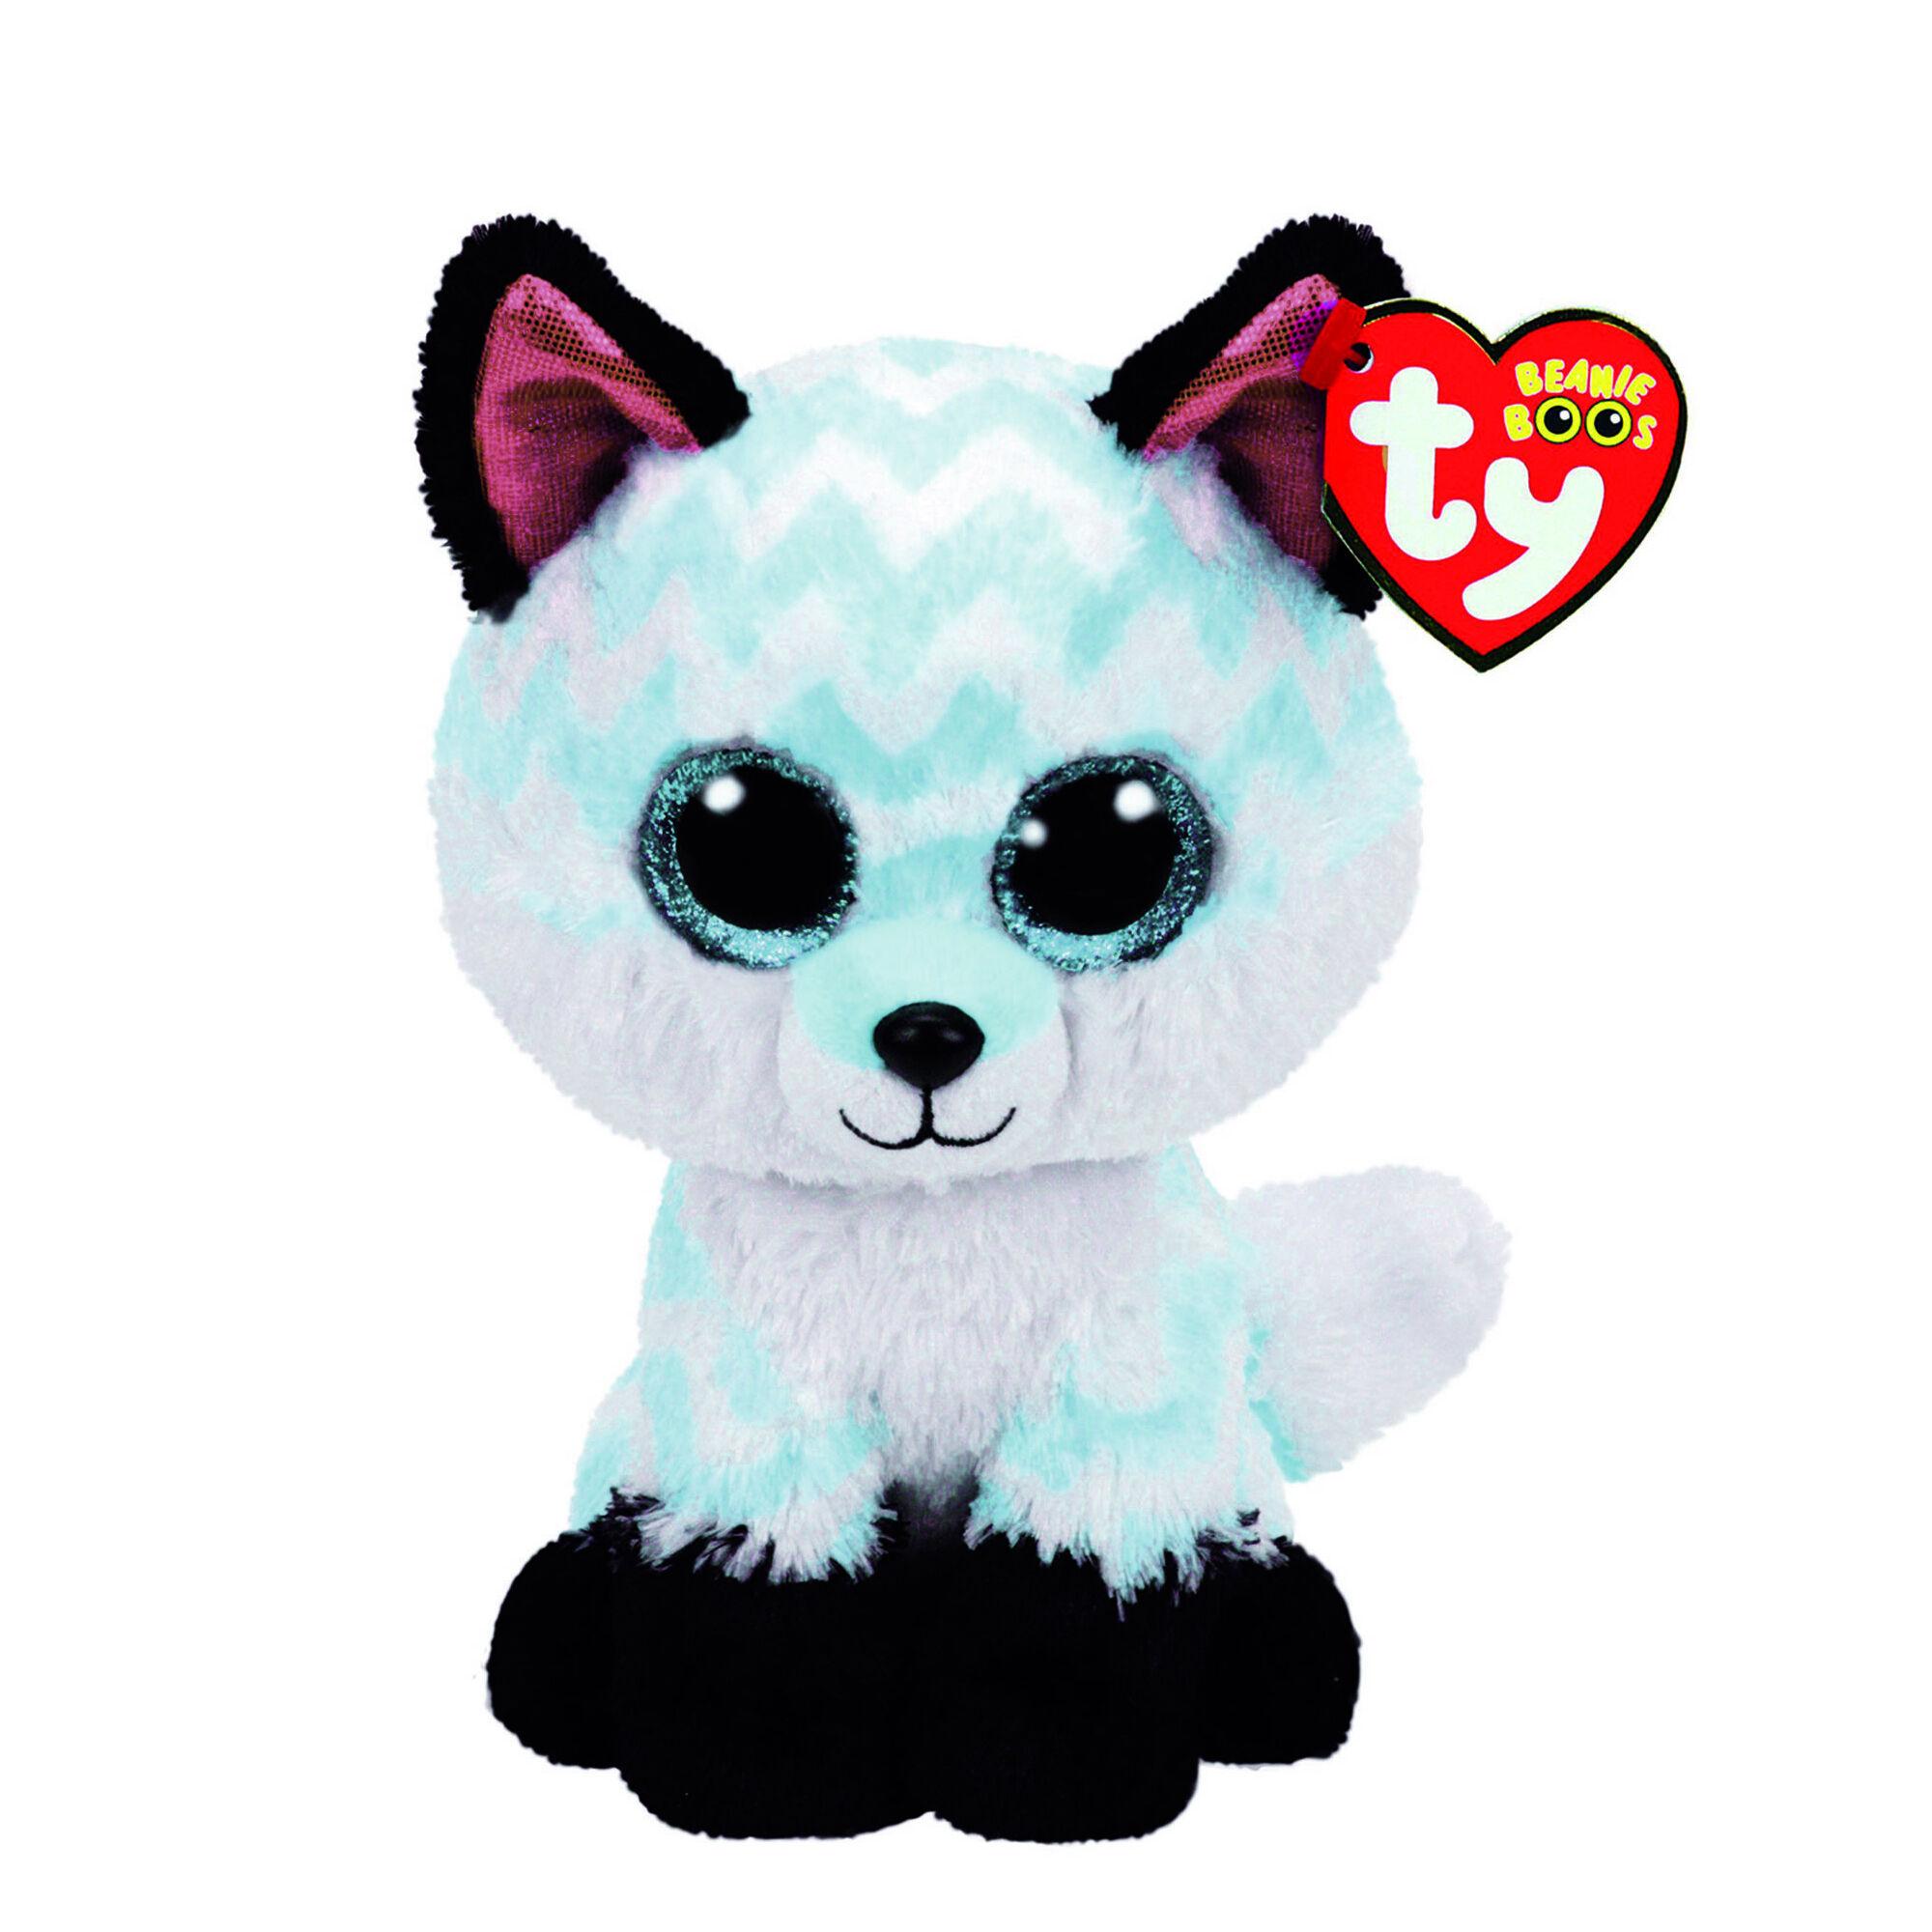 TY Beanie Boos & Beanie Baby Toys | Claire's